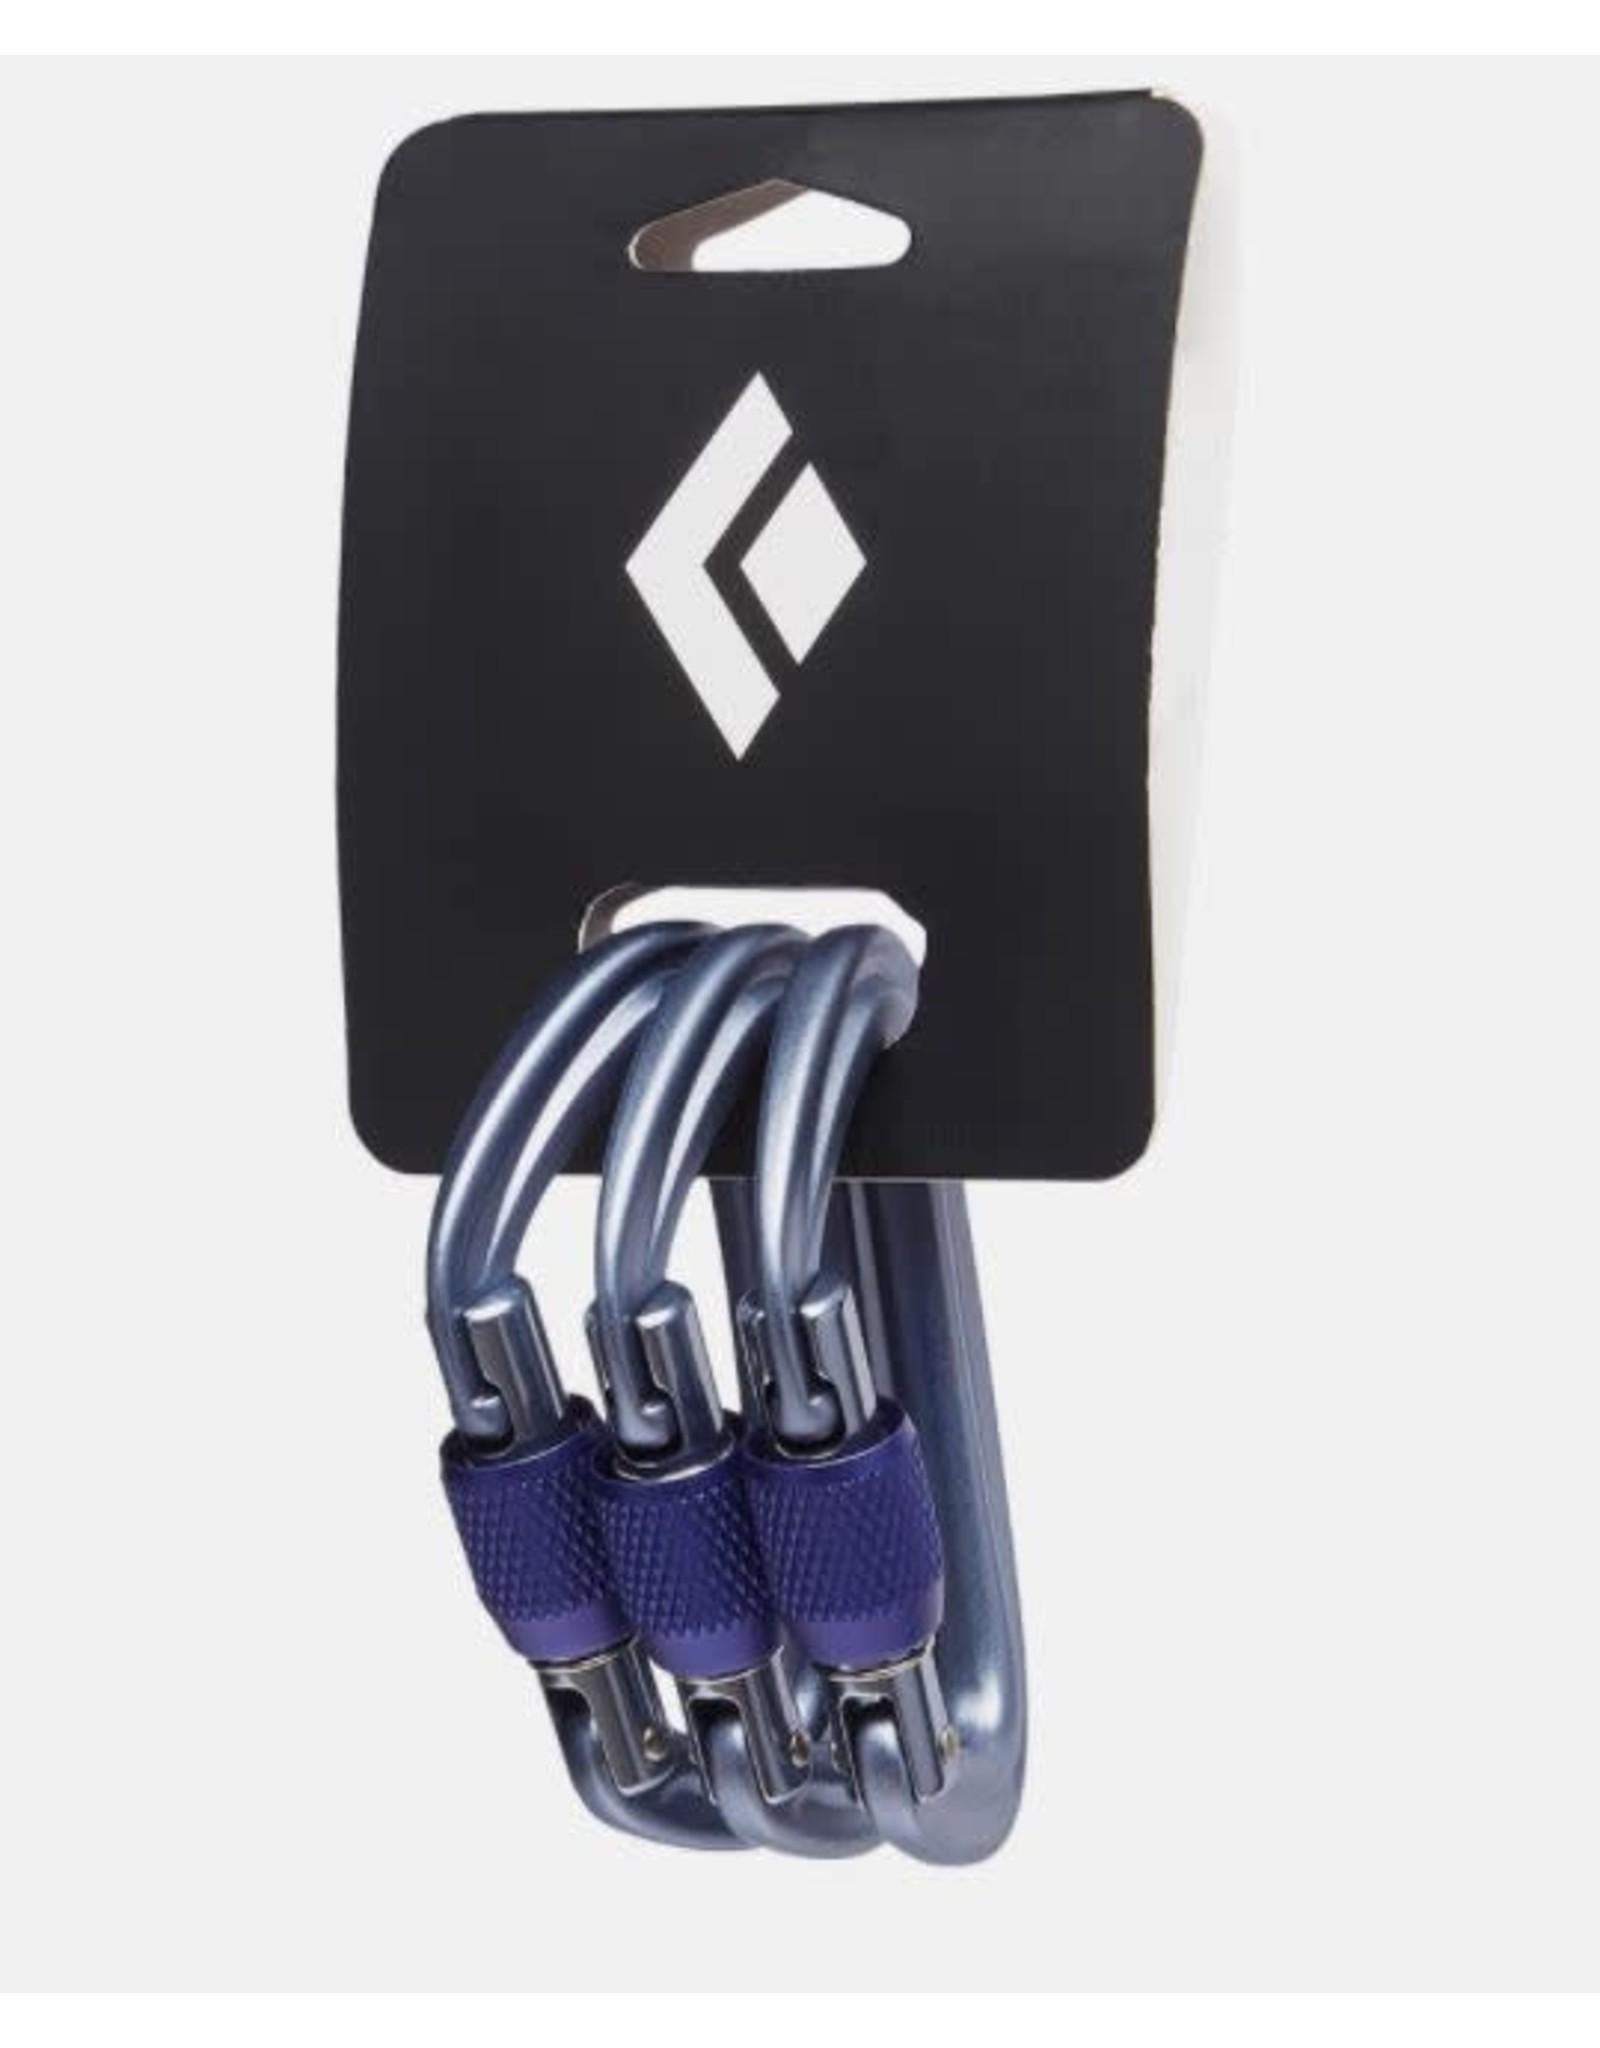 BLACK DIAMOND BLACK DIAMOND LITEFORGE CARABINER GREY 3 Pack BD2102491003ALL1